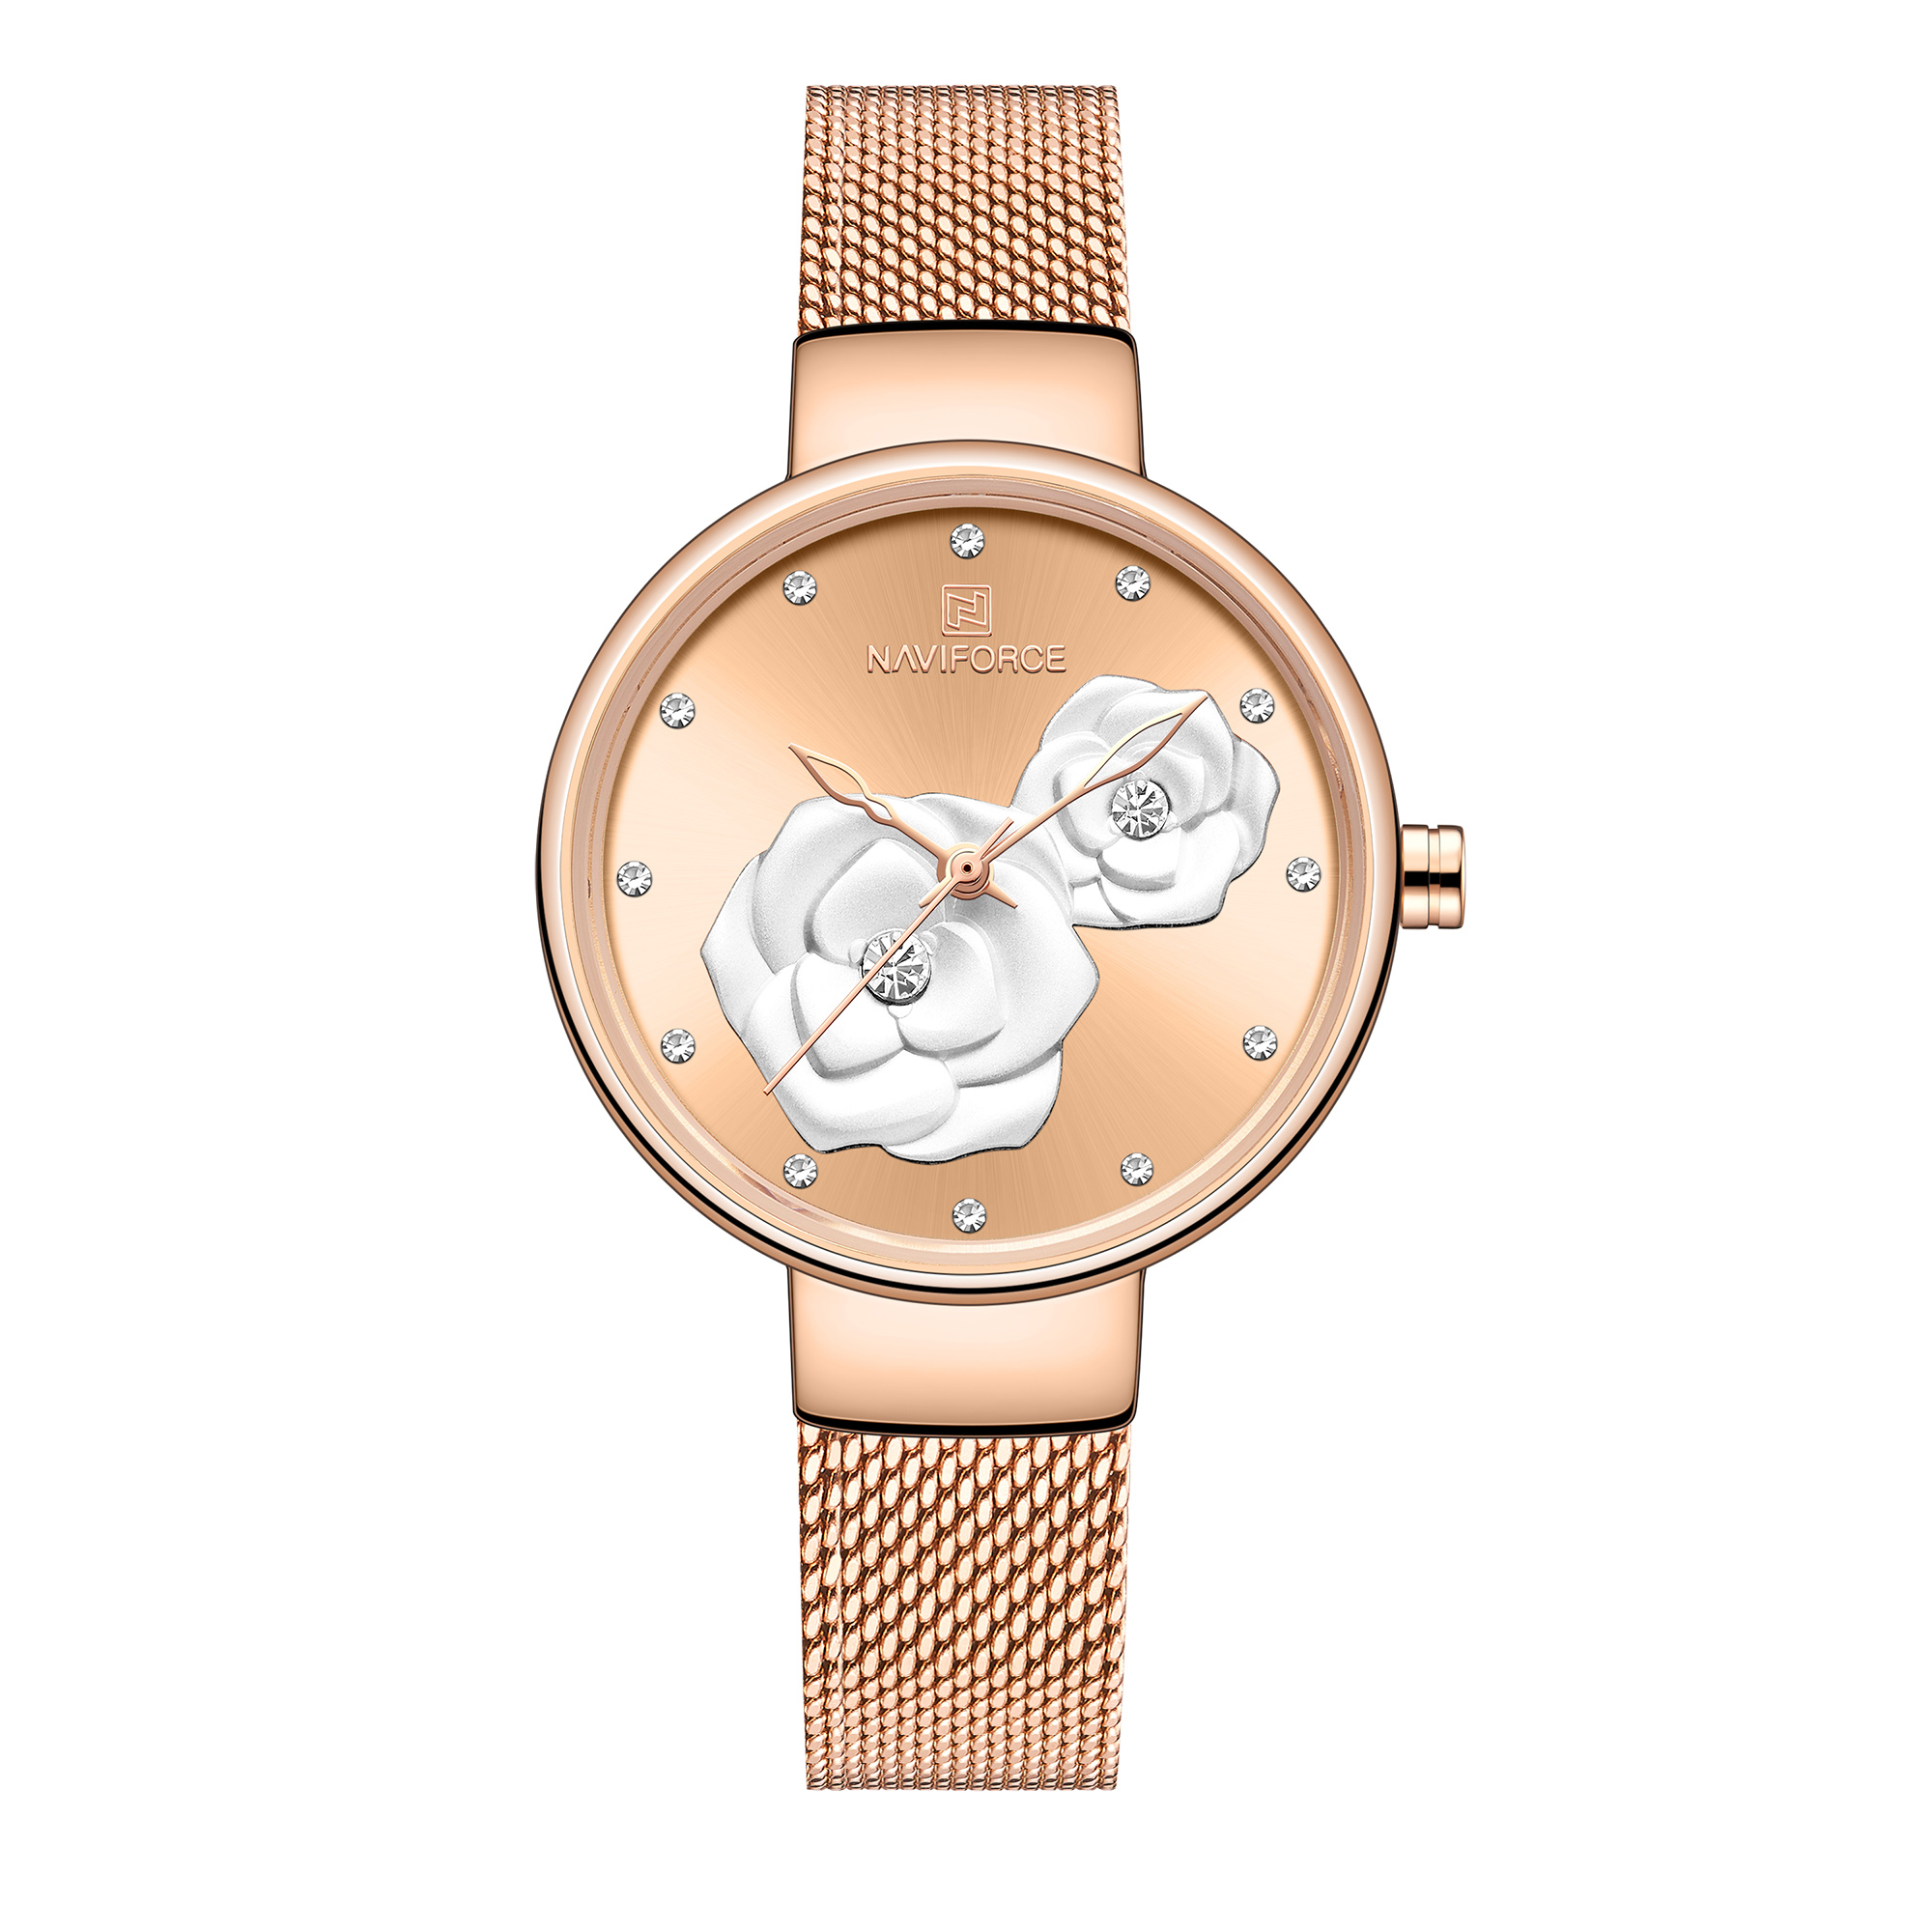 ساعت مچی عقربه ای زنانه نیوی فورس کد NF5013L- RG-RG-RG              خرید (⭐️⭐️⭐️)